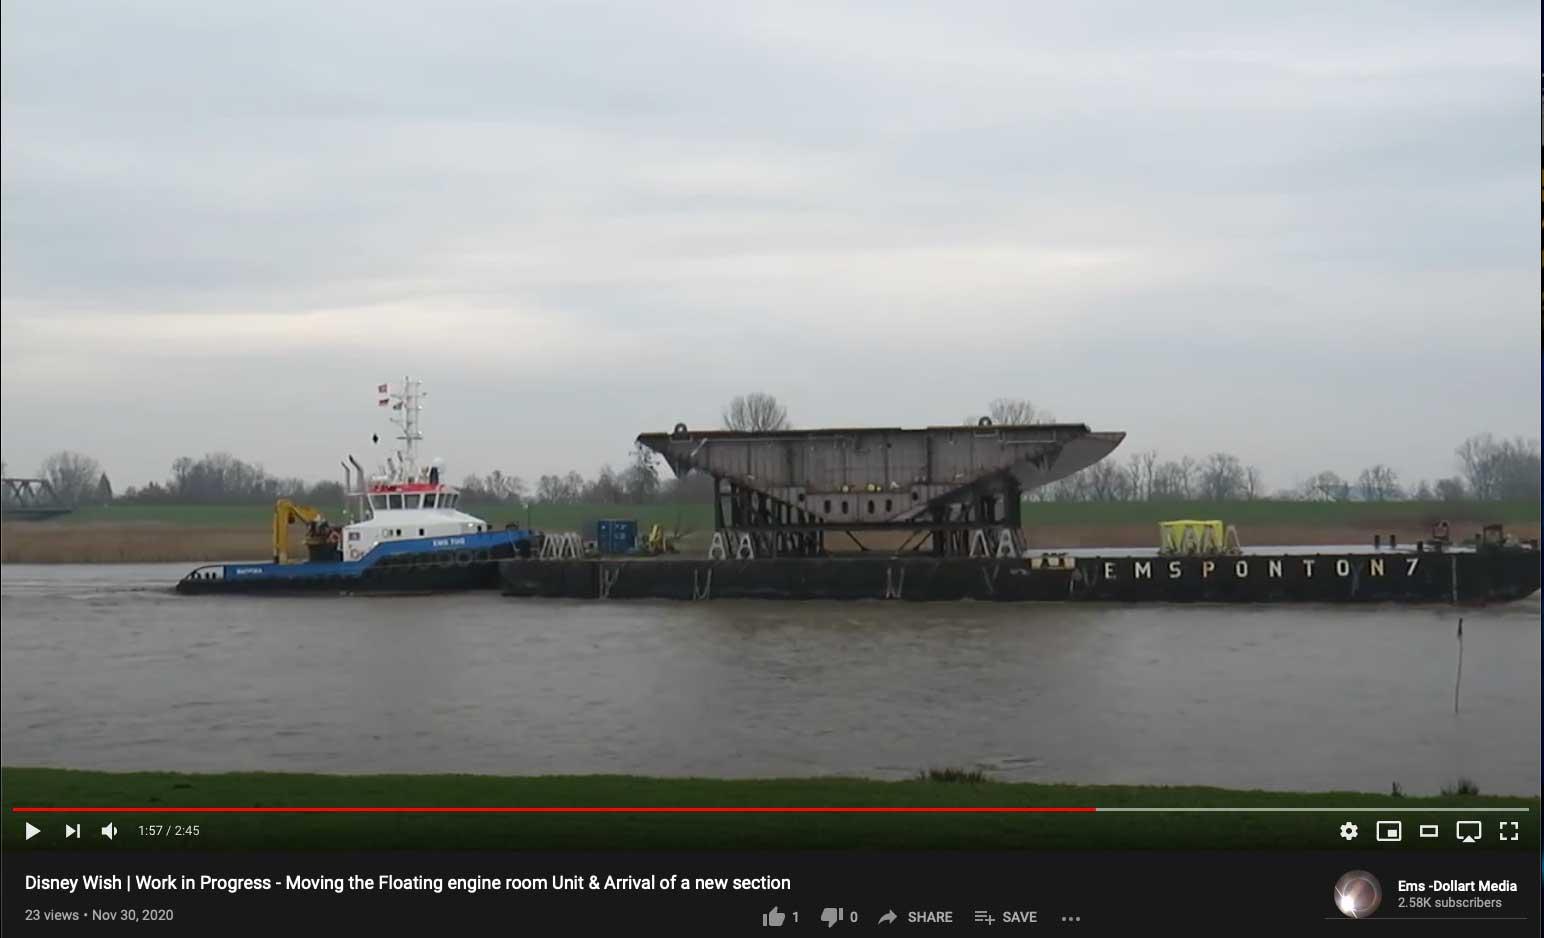 Disney Wish FERU New Block Meyer Werft Papenburg Germany 20201130